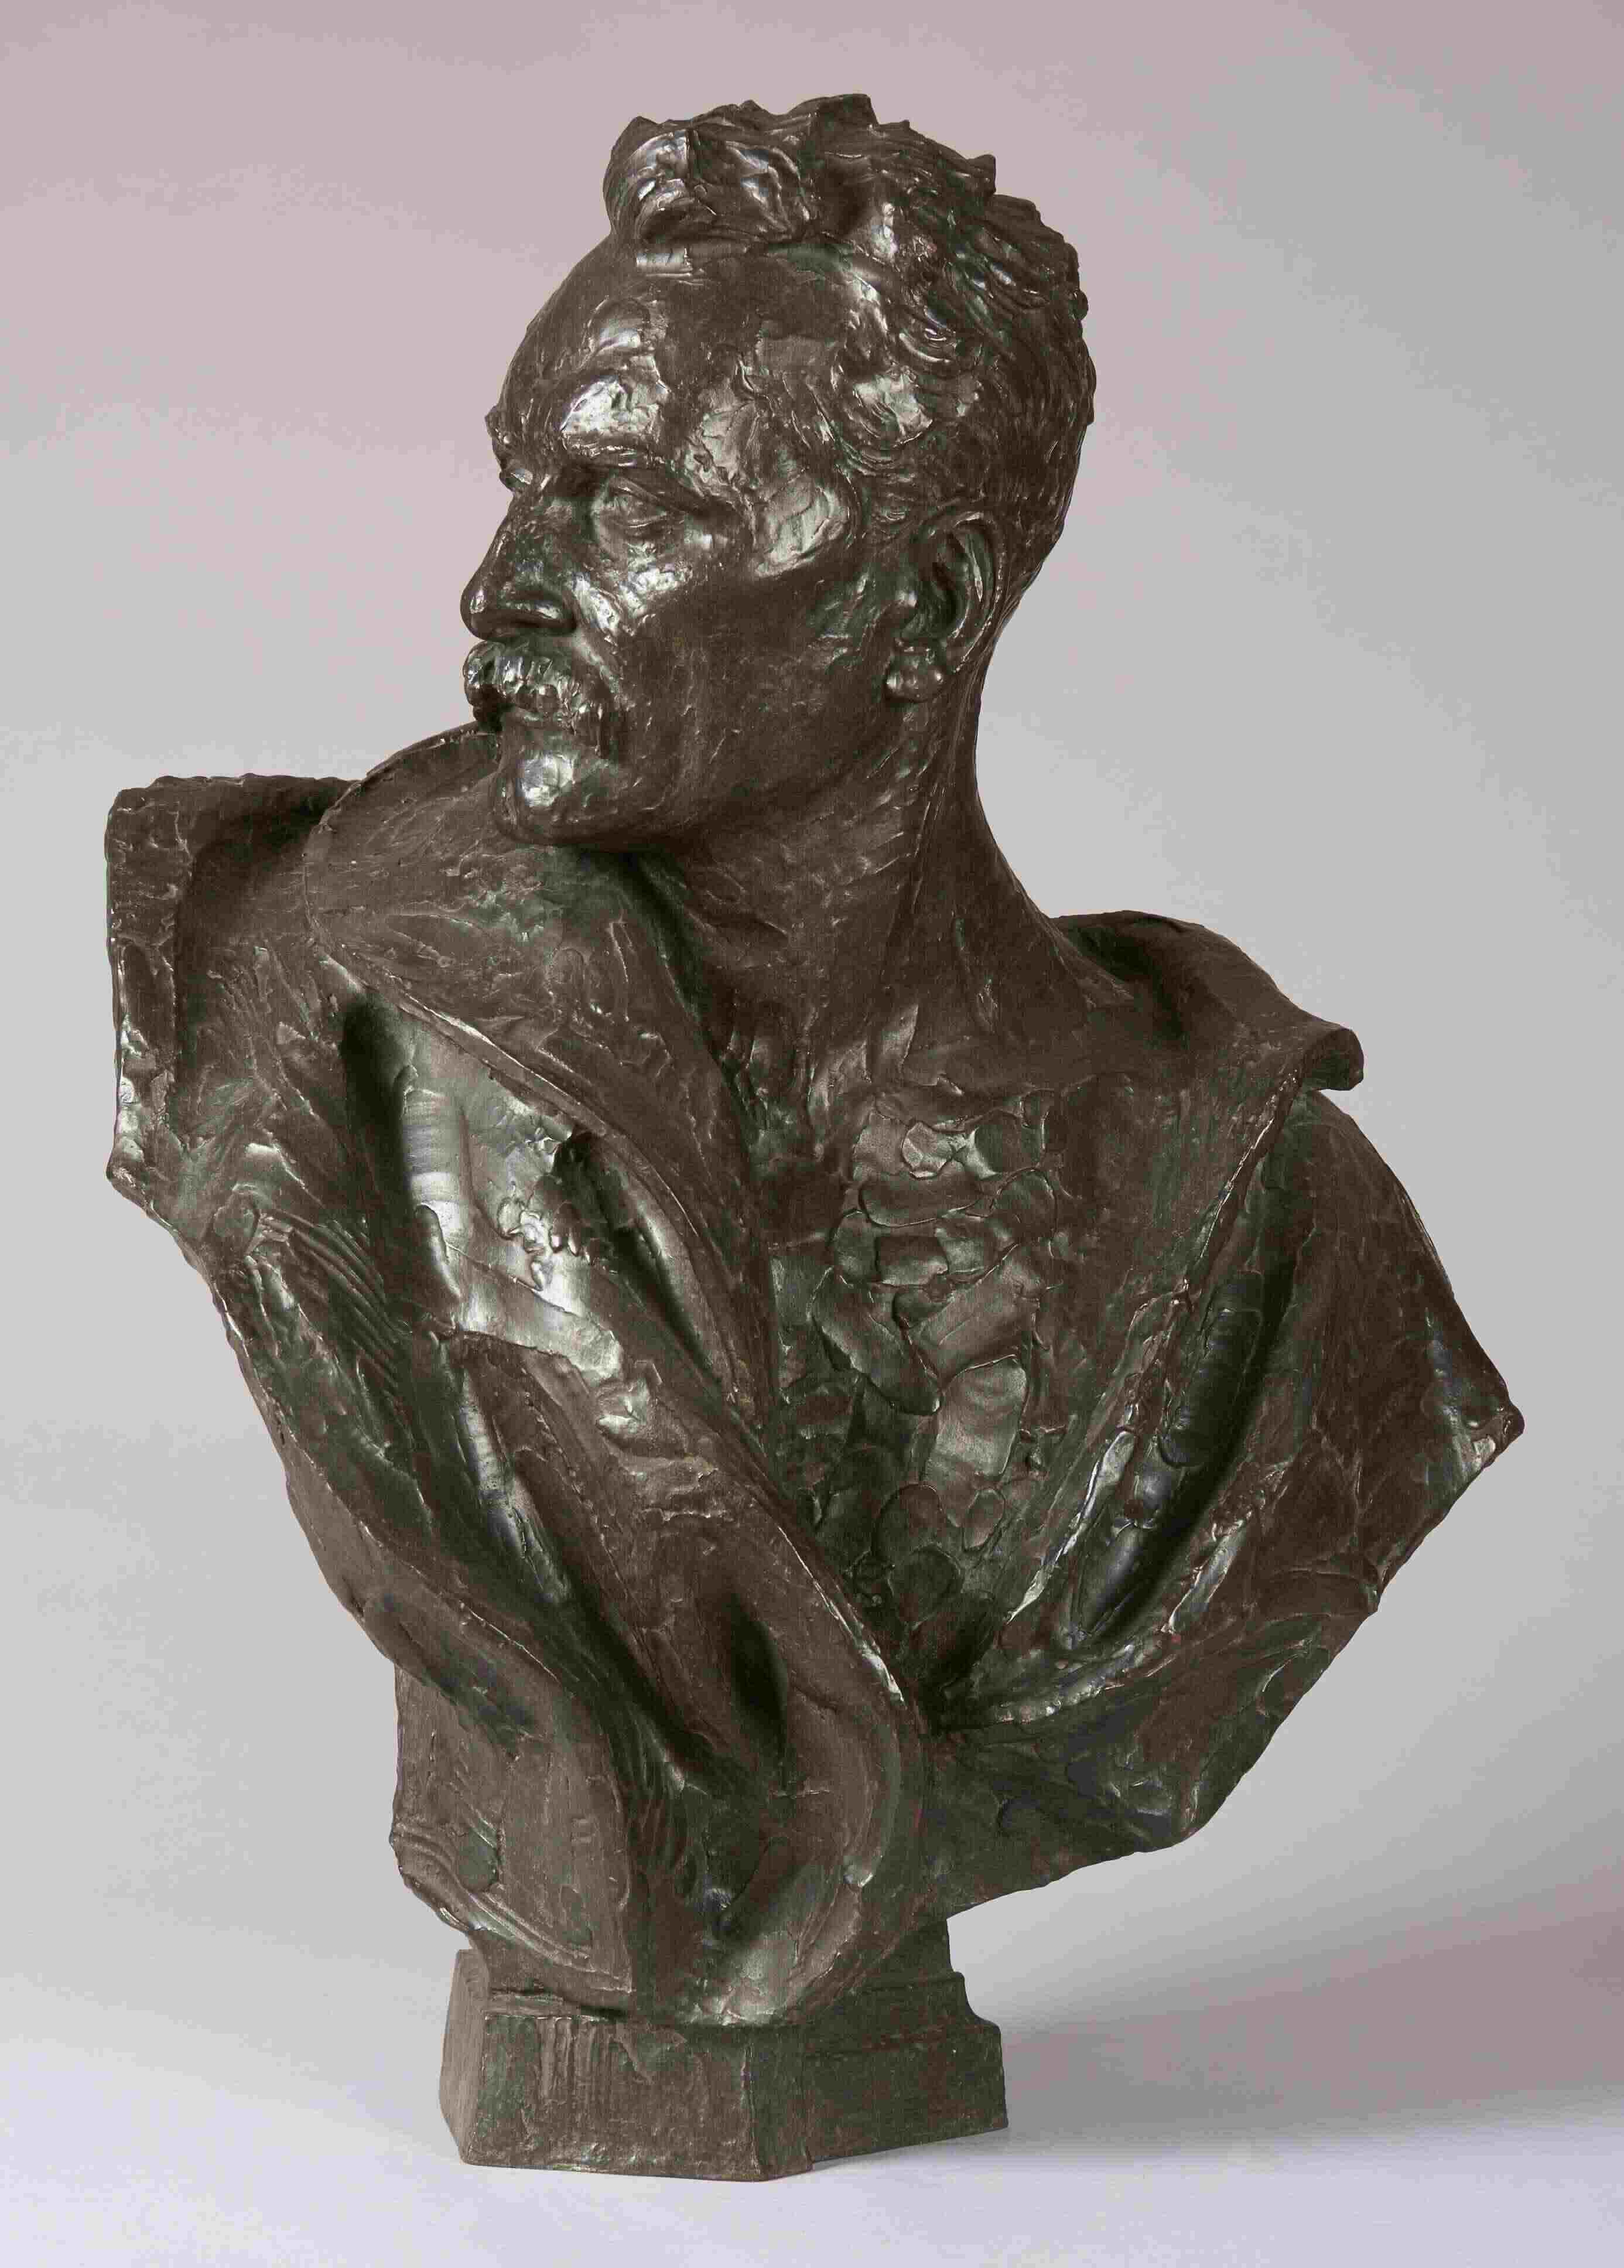 James Pittendrigh MacGillivray, Portrait of an Artist, William Skeoch Cumming (1864-1929), 1920. City Art Centre, Museums & Galleries Edinburgh.